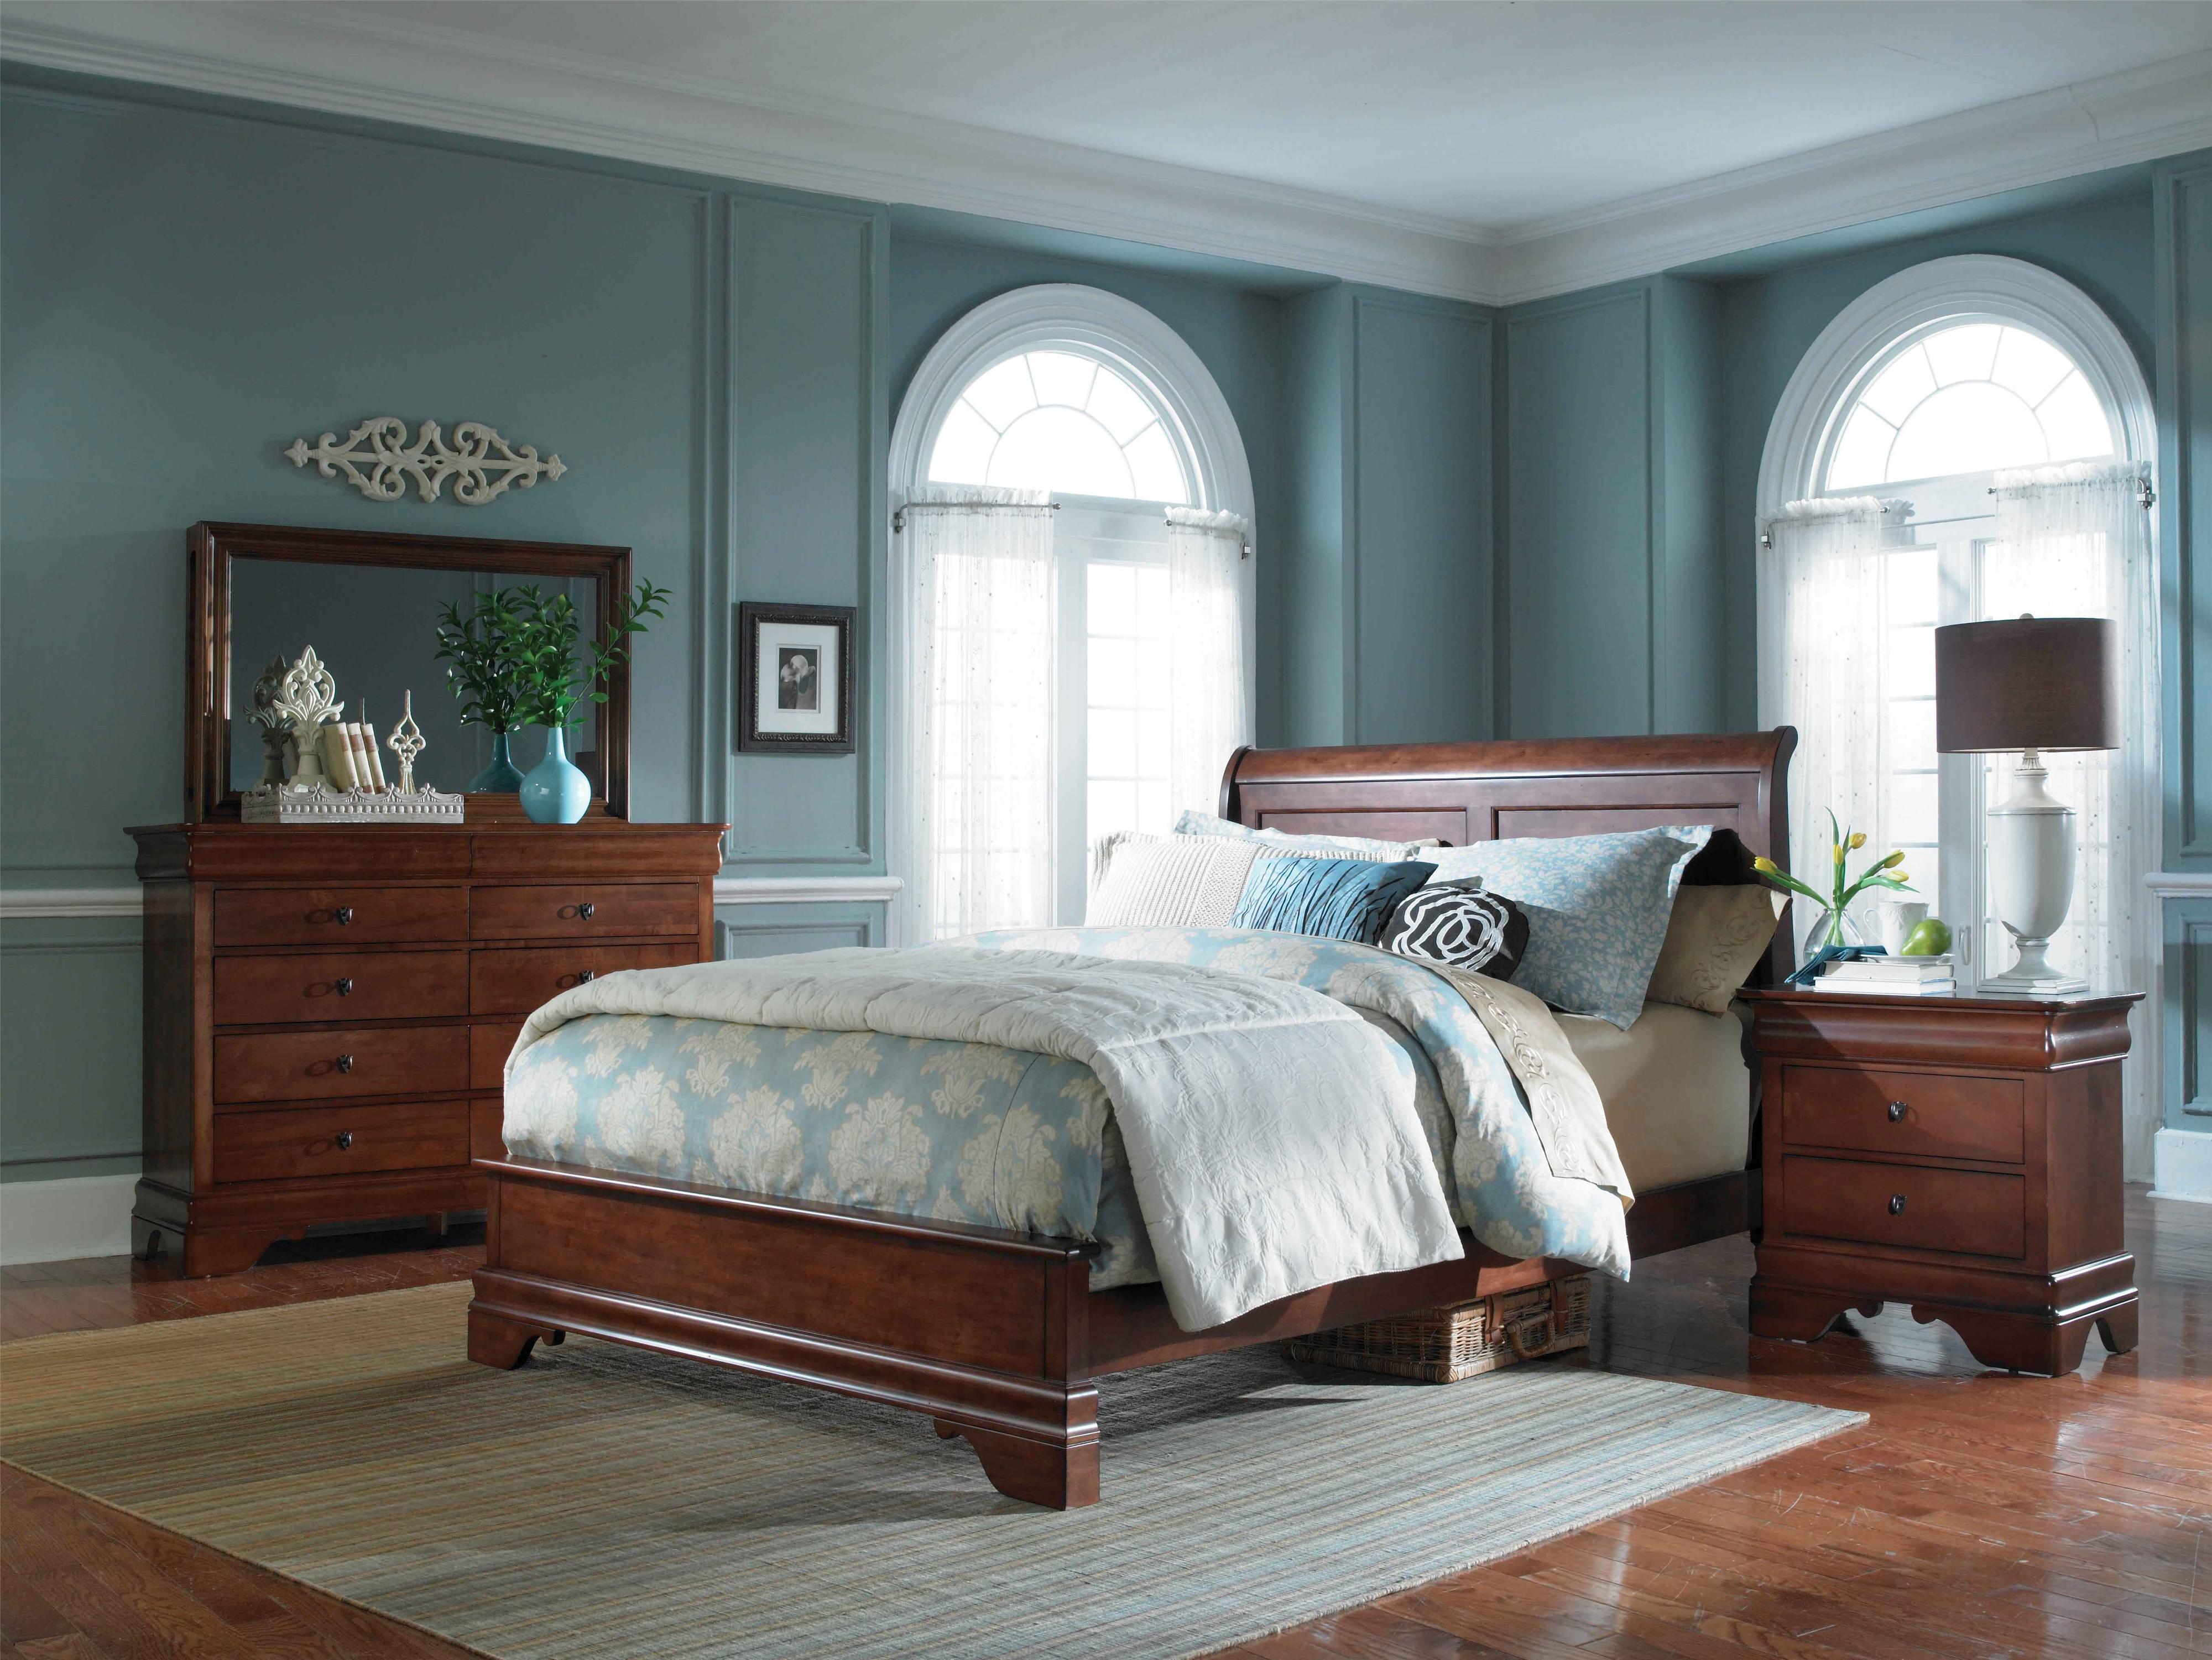 Rice Bedroom Set - Home Design Ideas